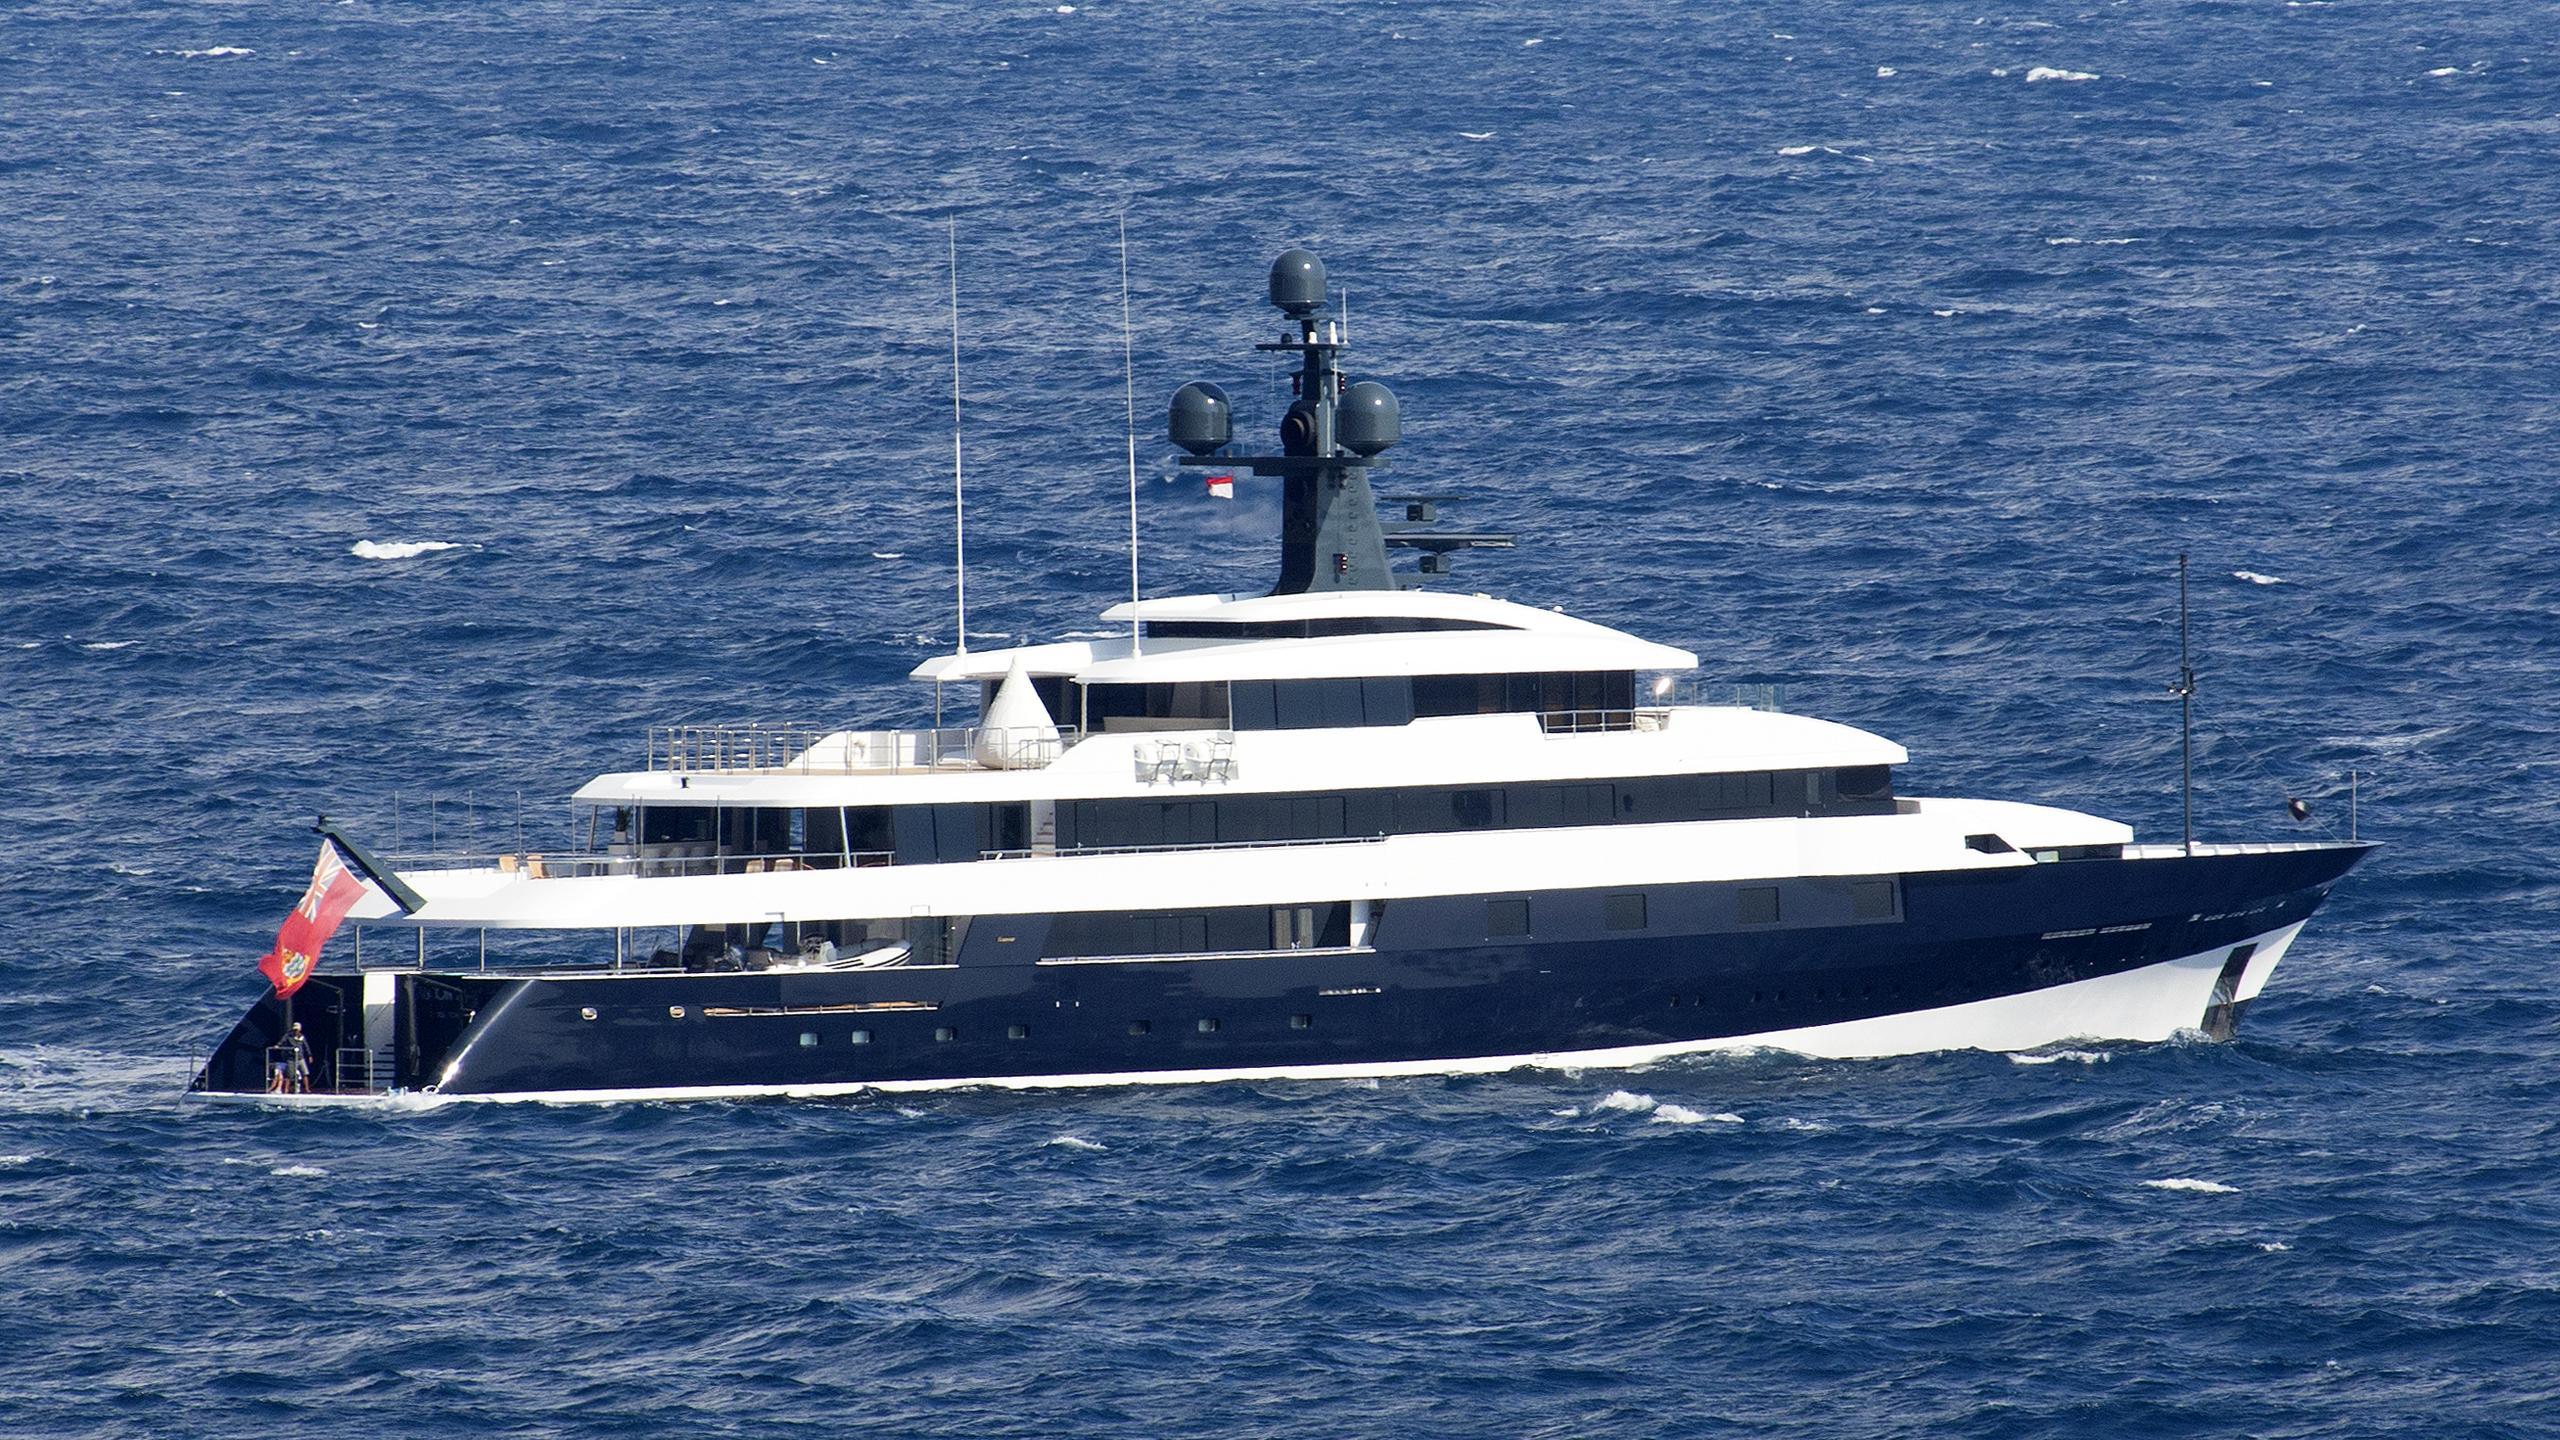 falcon-lair-motor-yacht-feadship-1983-67m-profile